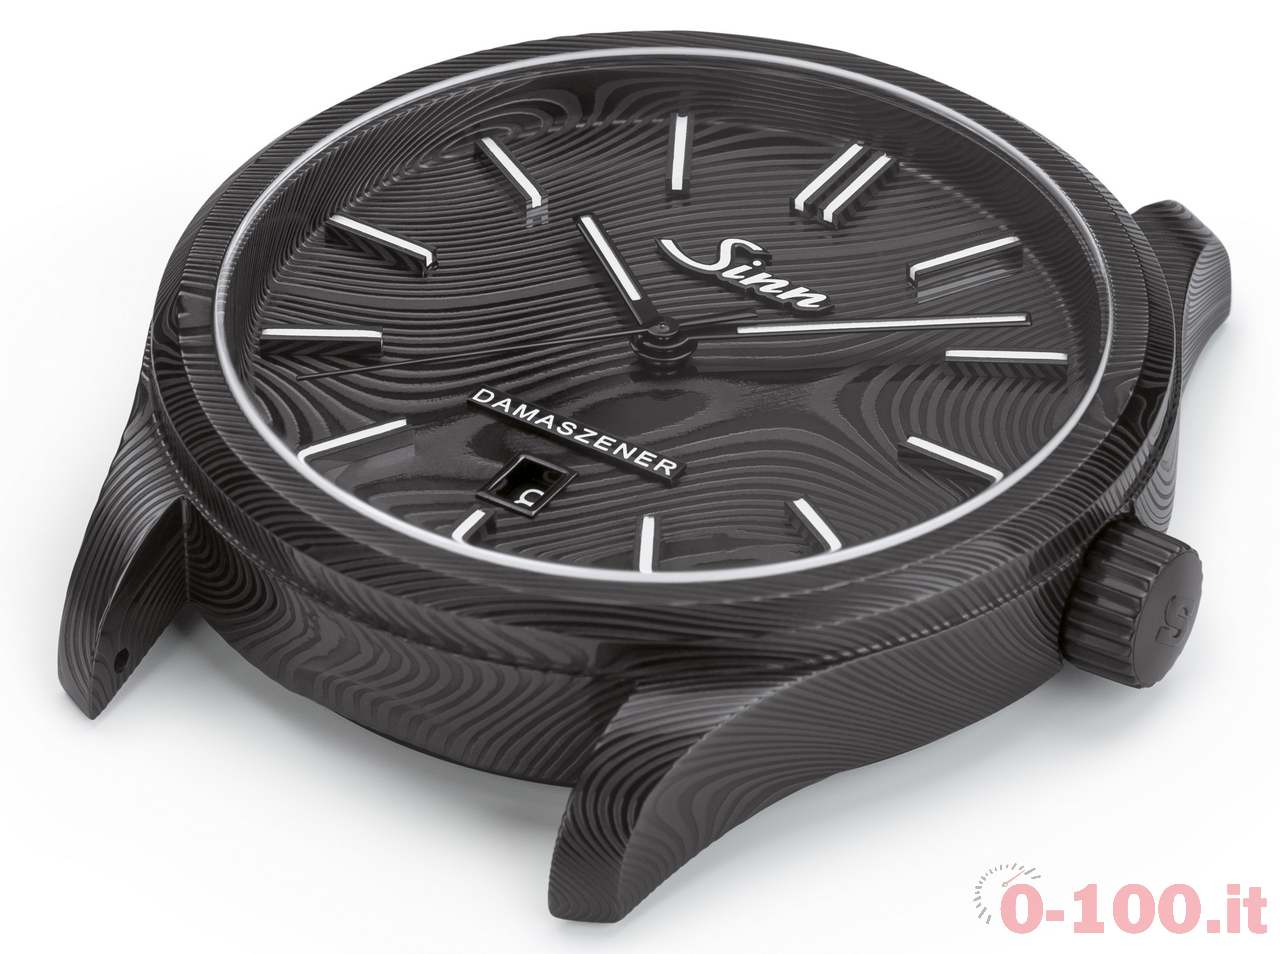 sinn-1800-s-damaszener-limited-edition-prezzo-price_0-1002